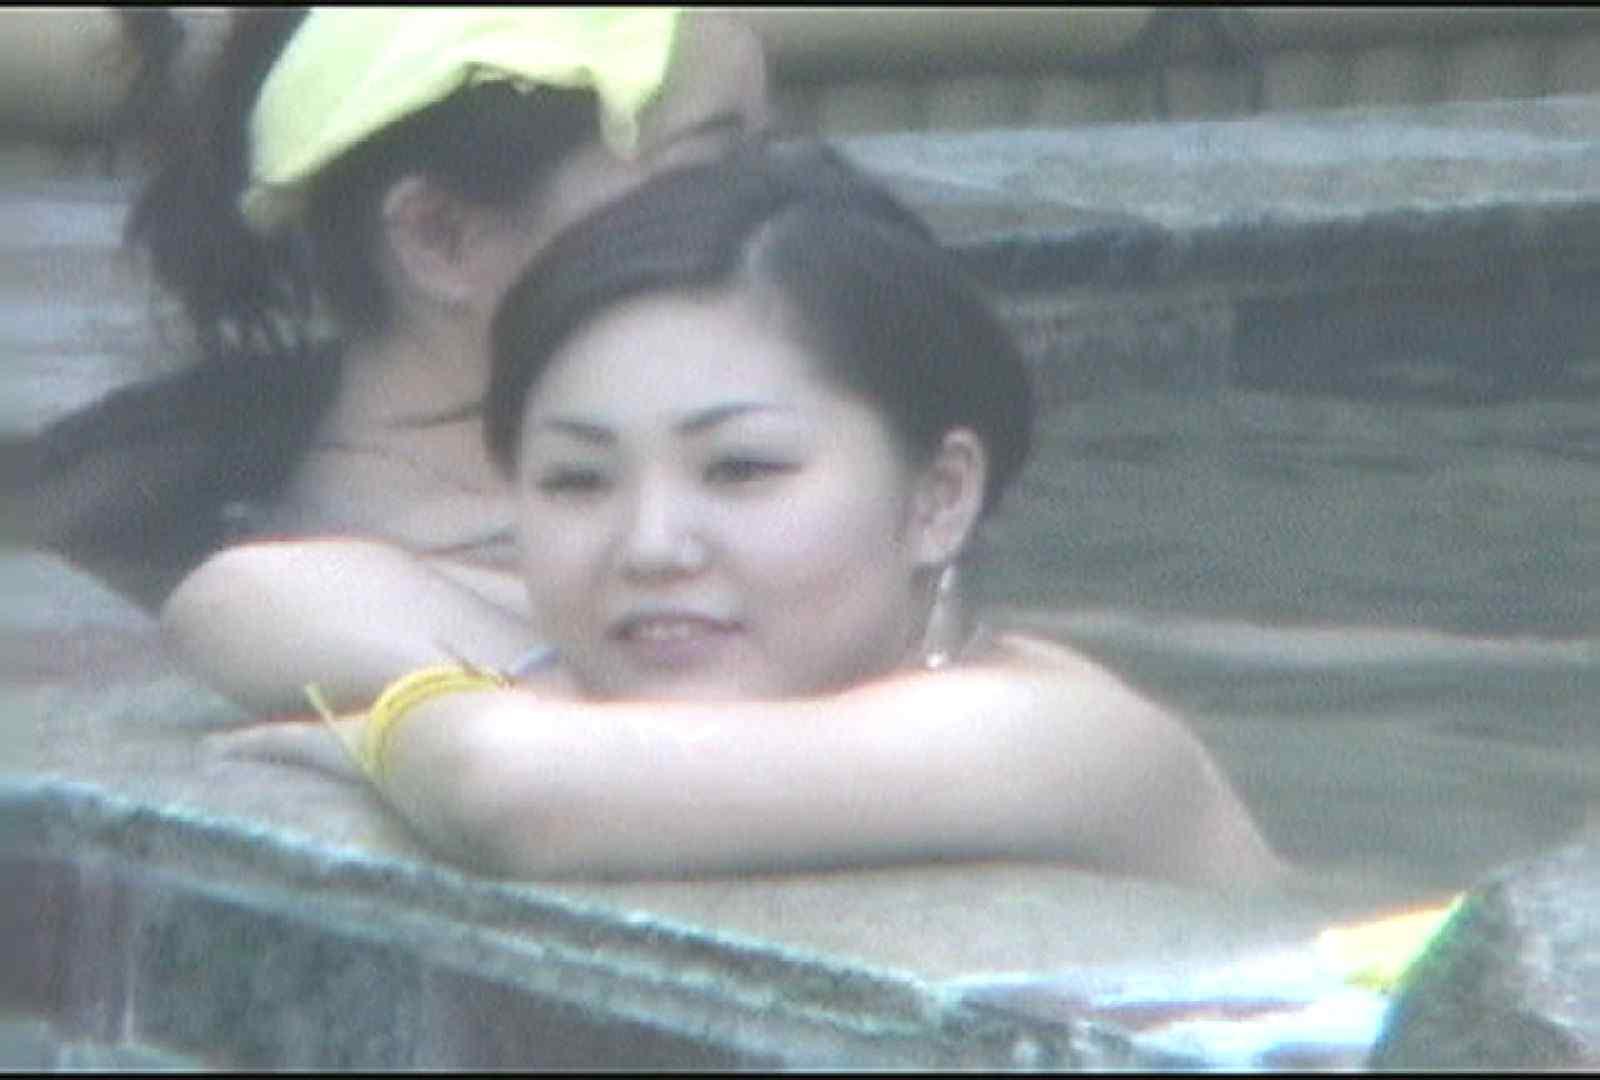 Aquaな露天風呂Vol.145 盗撮   OLセックス  106画像 31